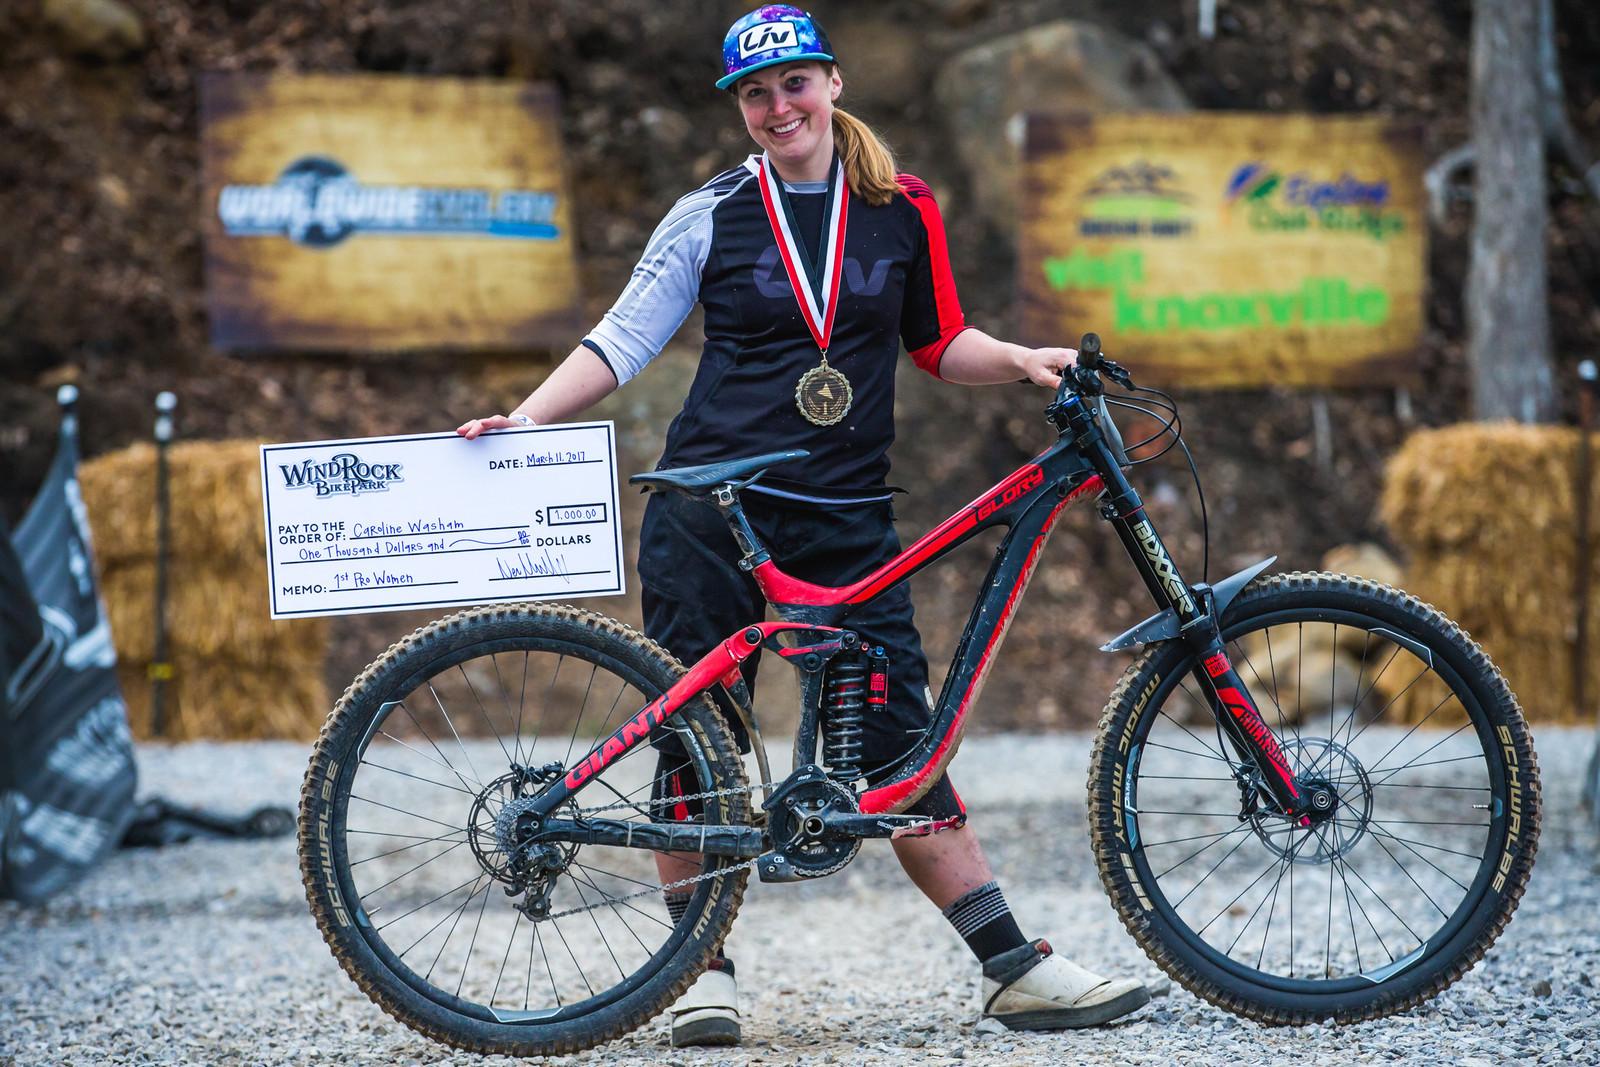 WINNER'S CIRCLE Pro GRT Windrock - Caroline Washam with her Giant Glory Advanced - WINNER'S CIRCLE - Pro GRT Windrock - Mountain Biking Pictures - Vital MTB